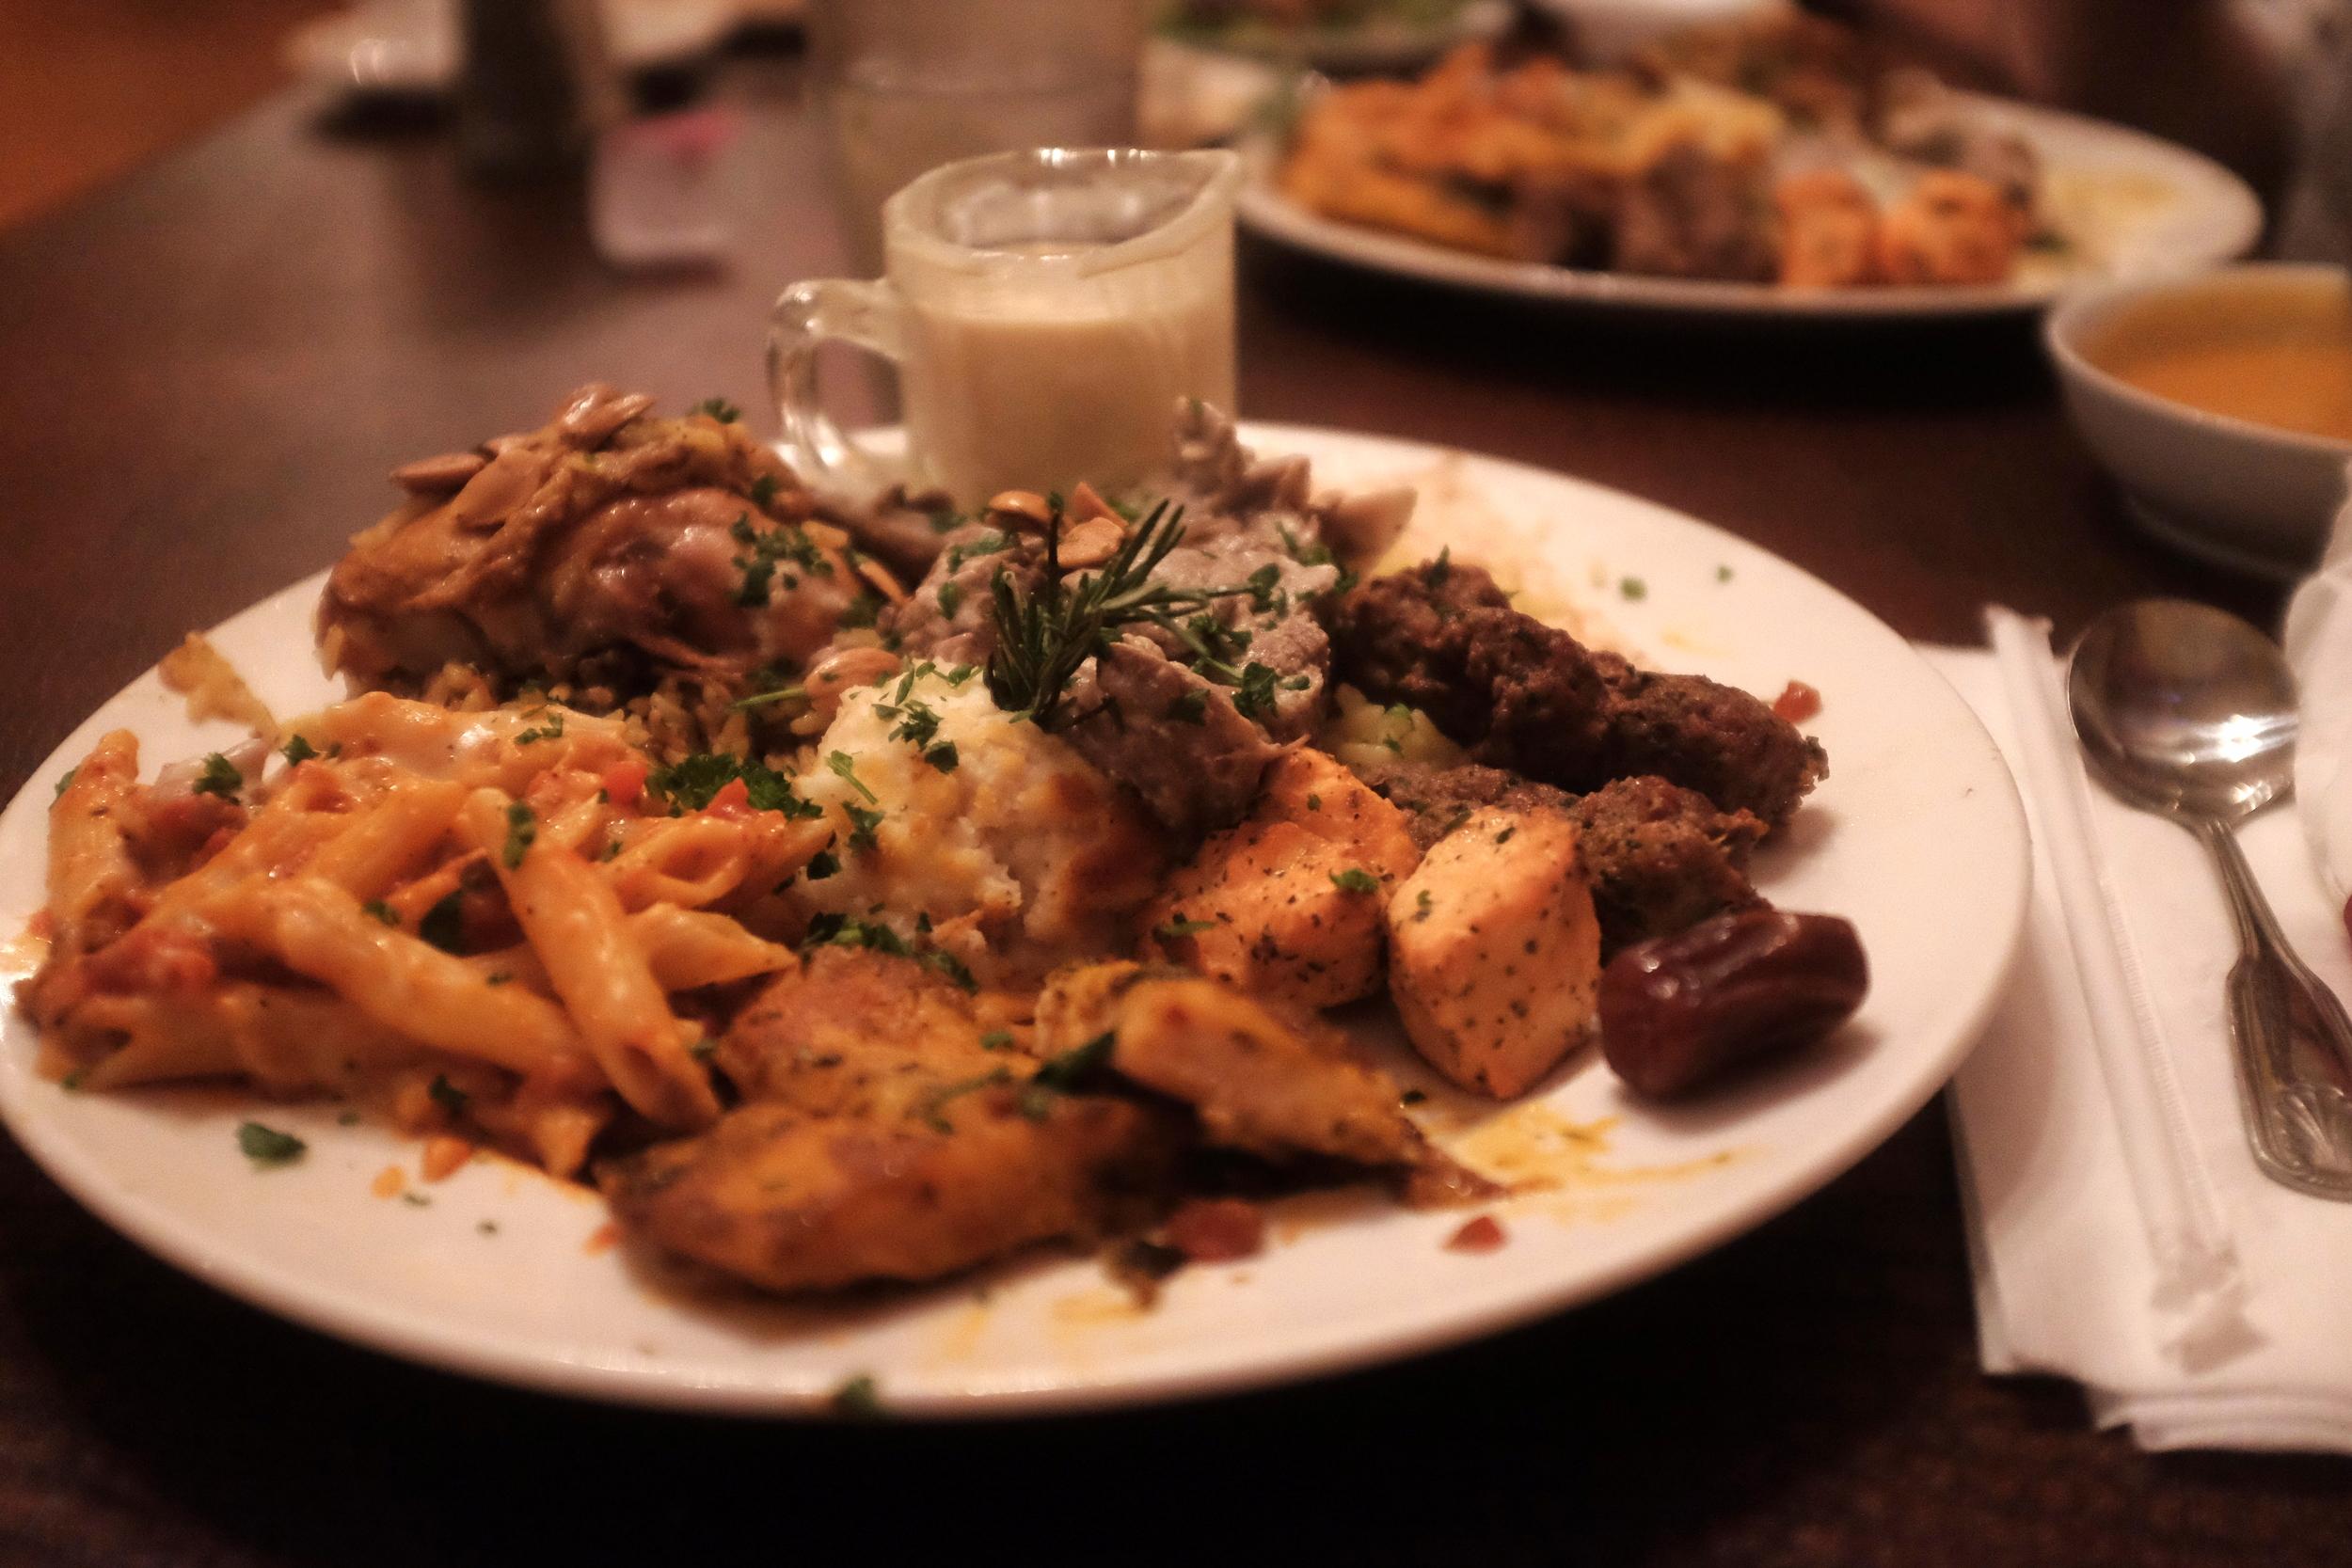 And what a feast it is: Maklouba, Mansaf, Potatoes, Pasta, Kofta, Kebab, and fish!